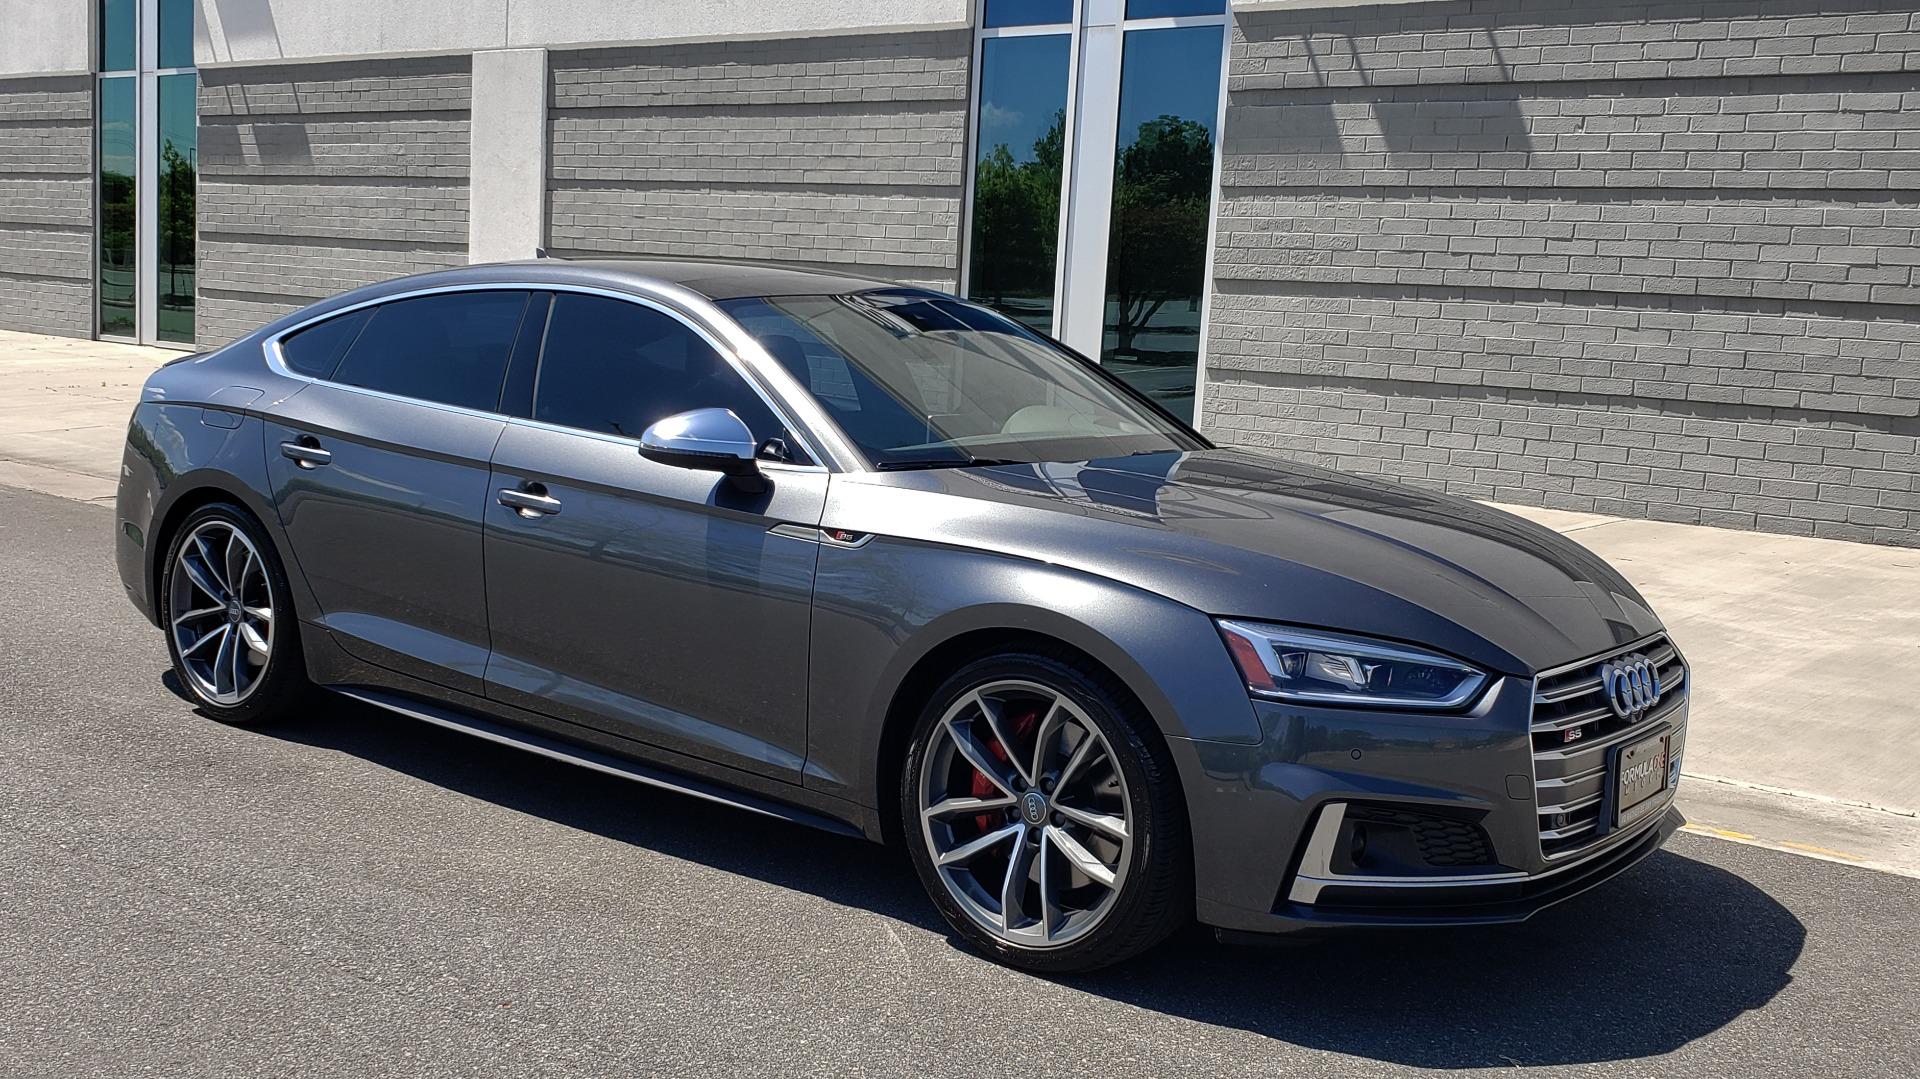 Used 2018 Audi S5 SPORTBACK PRESTIGE S-SPORT / NAV / SUNROOF / HUD / B&O SND / REARVIEW for sale $48,995 at Formula Imports in Charlotte NC 28227 12